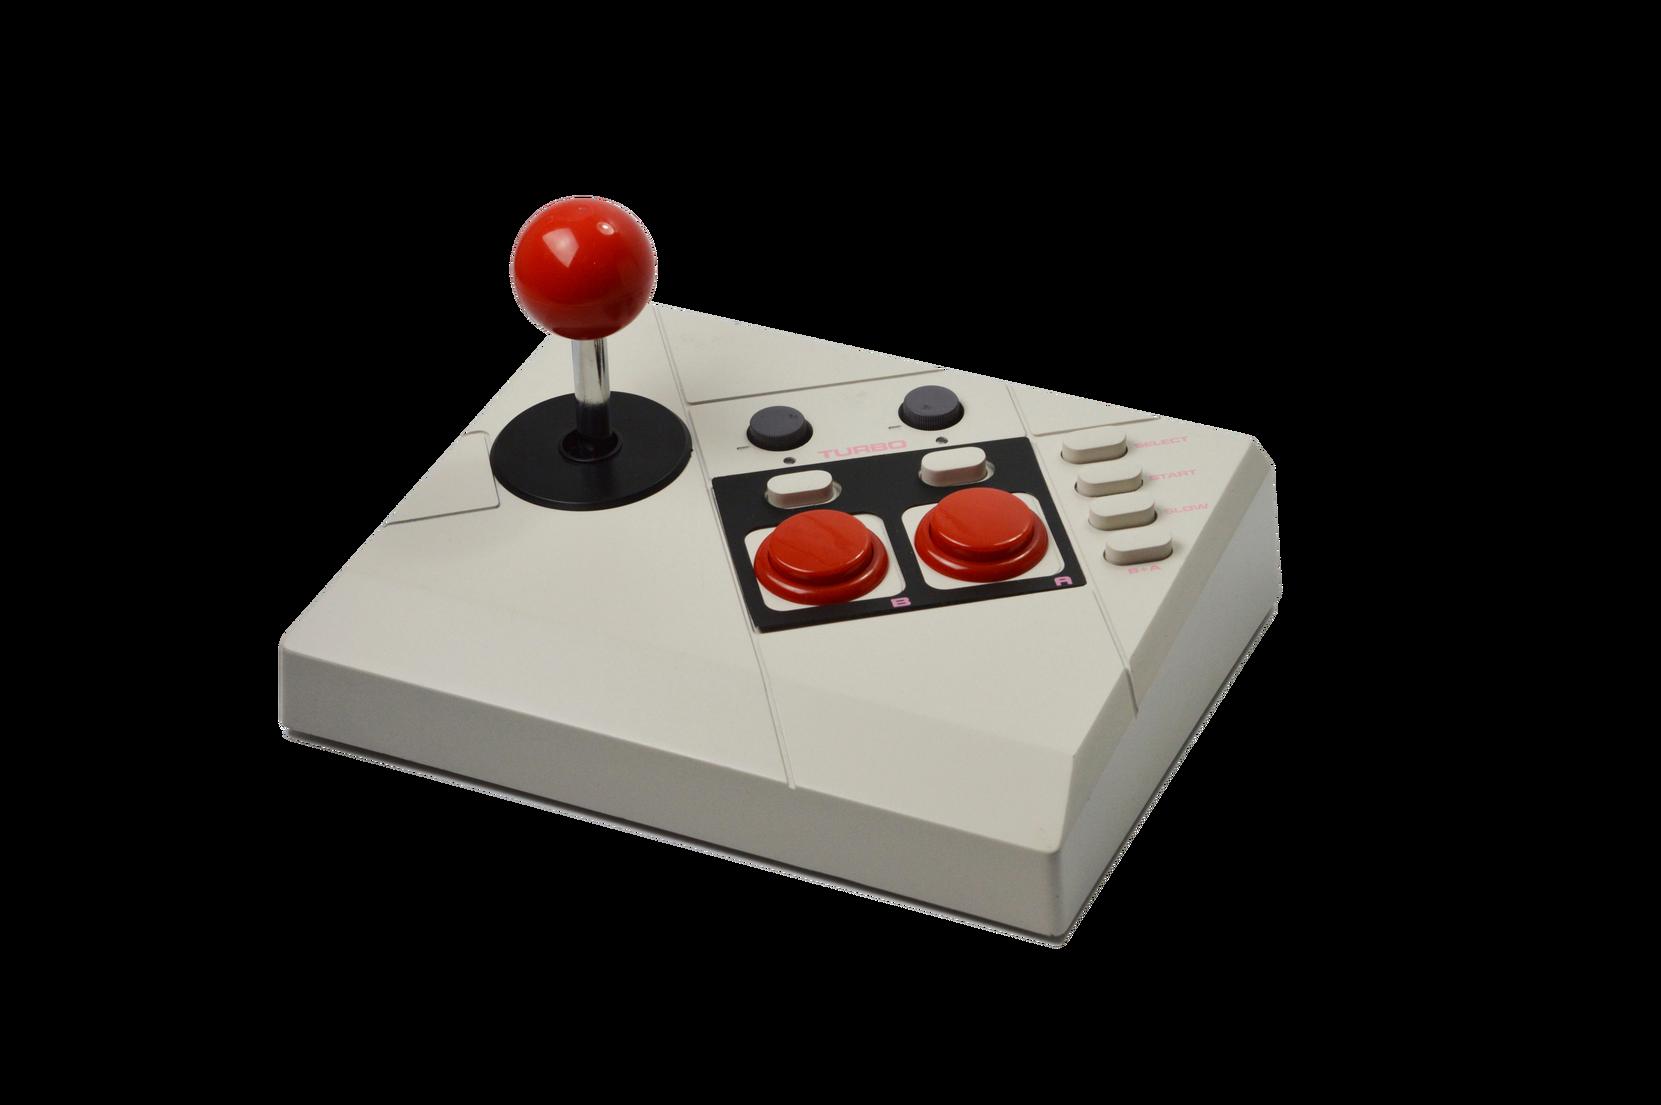 Edge Arcade Stick Mini Nes Steelplay Spiltilbehør til Boligen i Nintendo Classic Mini NES